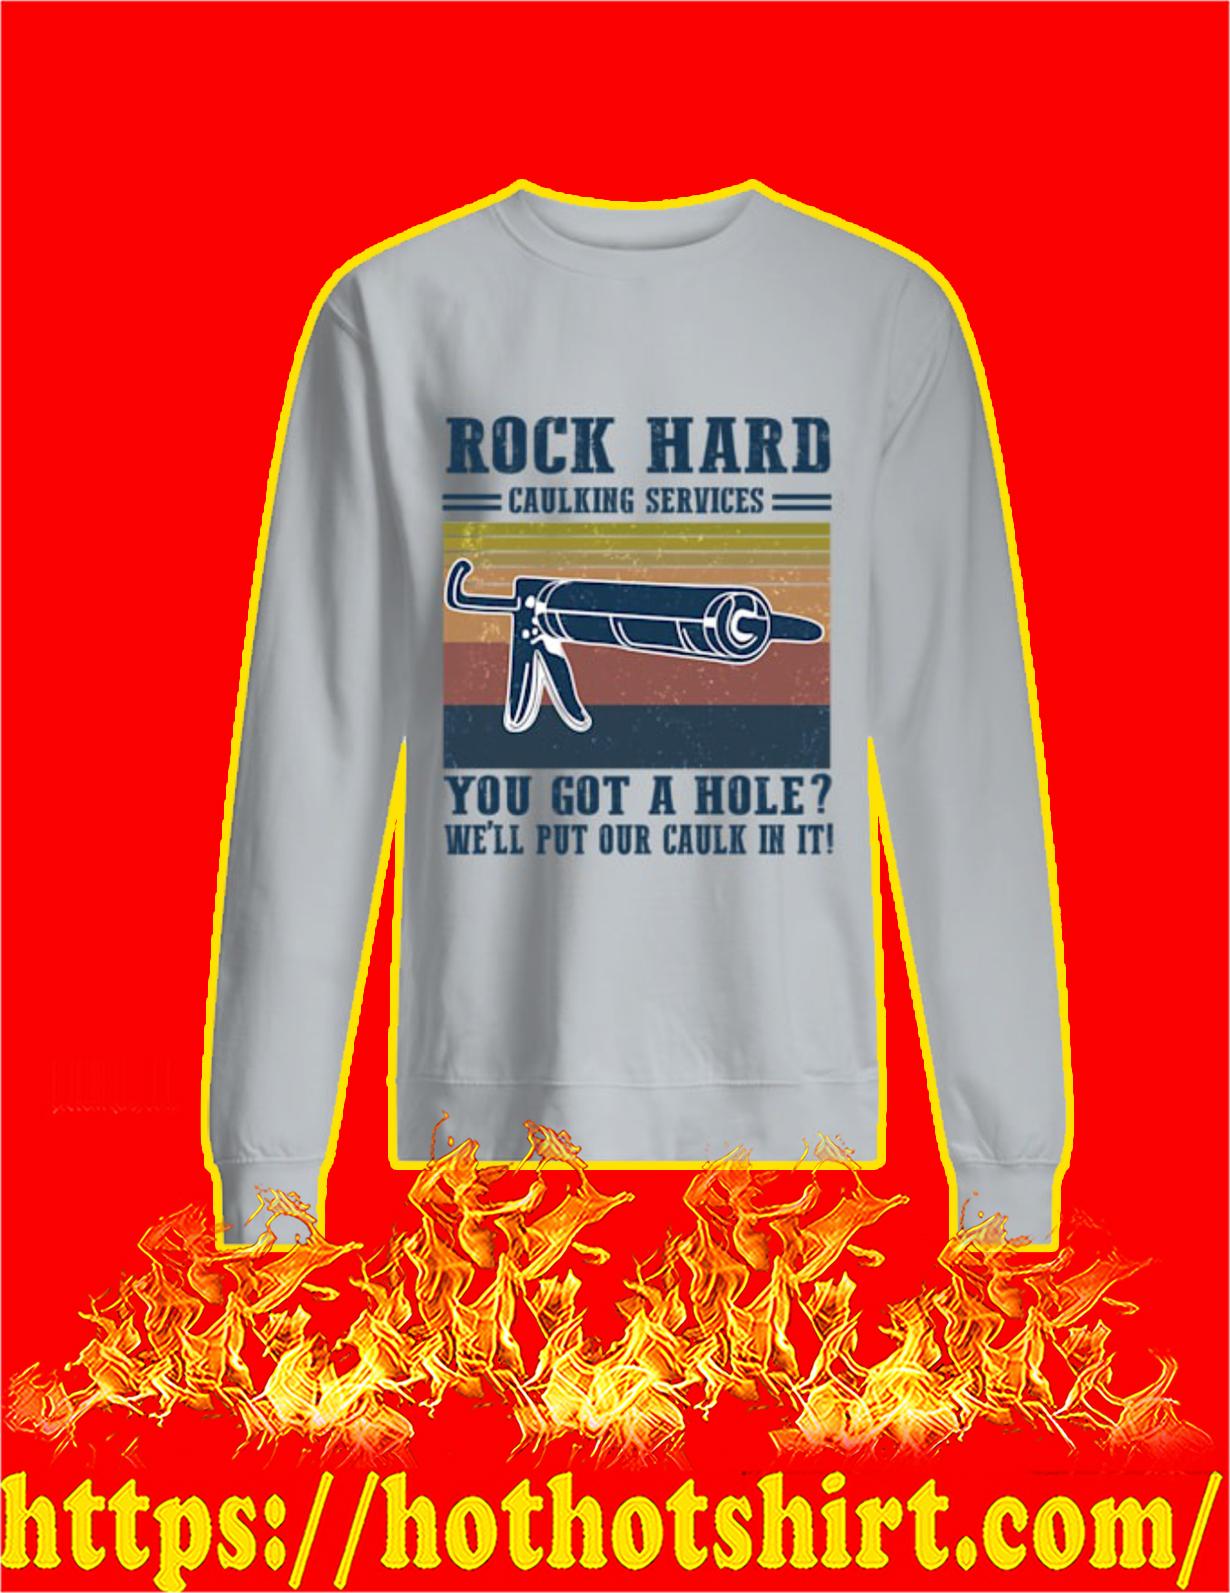 Rock hard caulking services you got a hole - sweatshirt